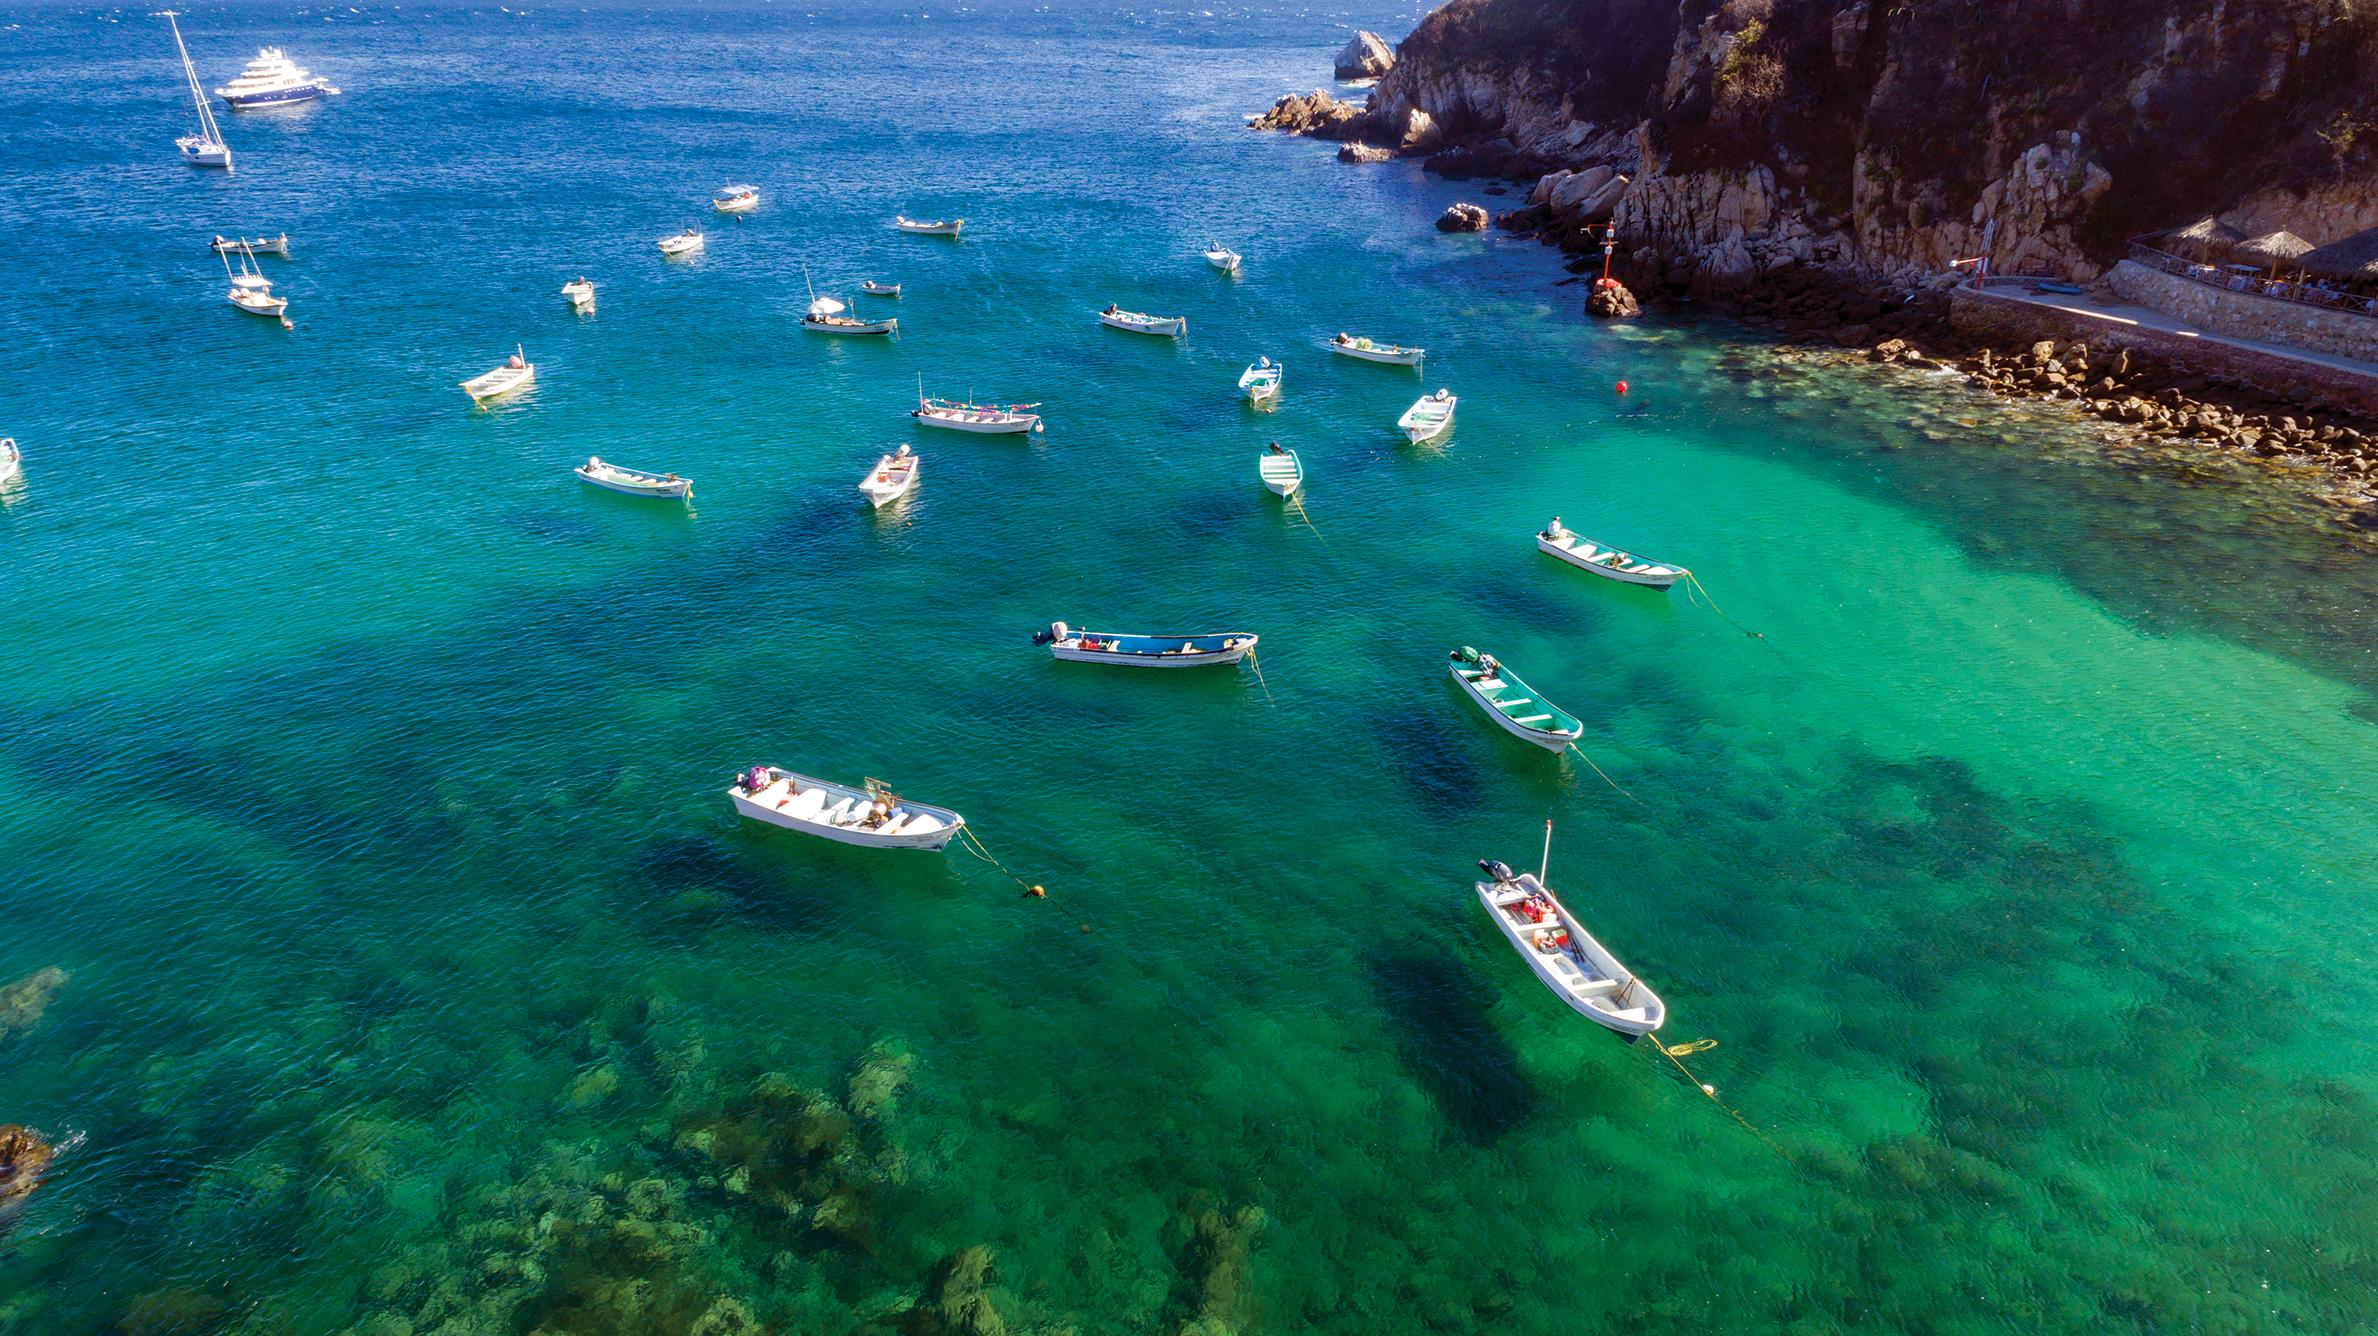 boating-private-tour-puerto-vallarta.jpeg